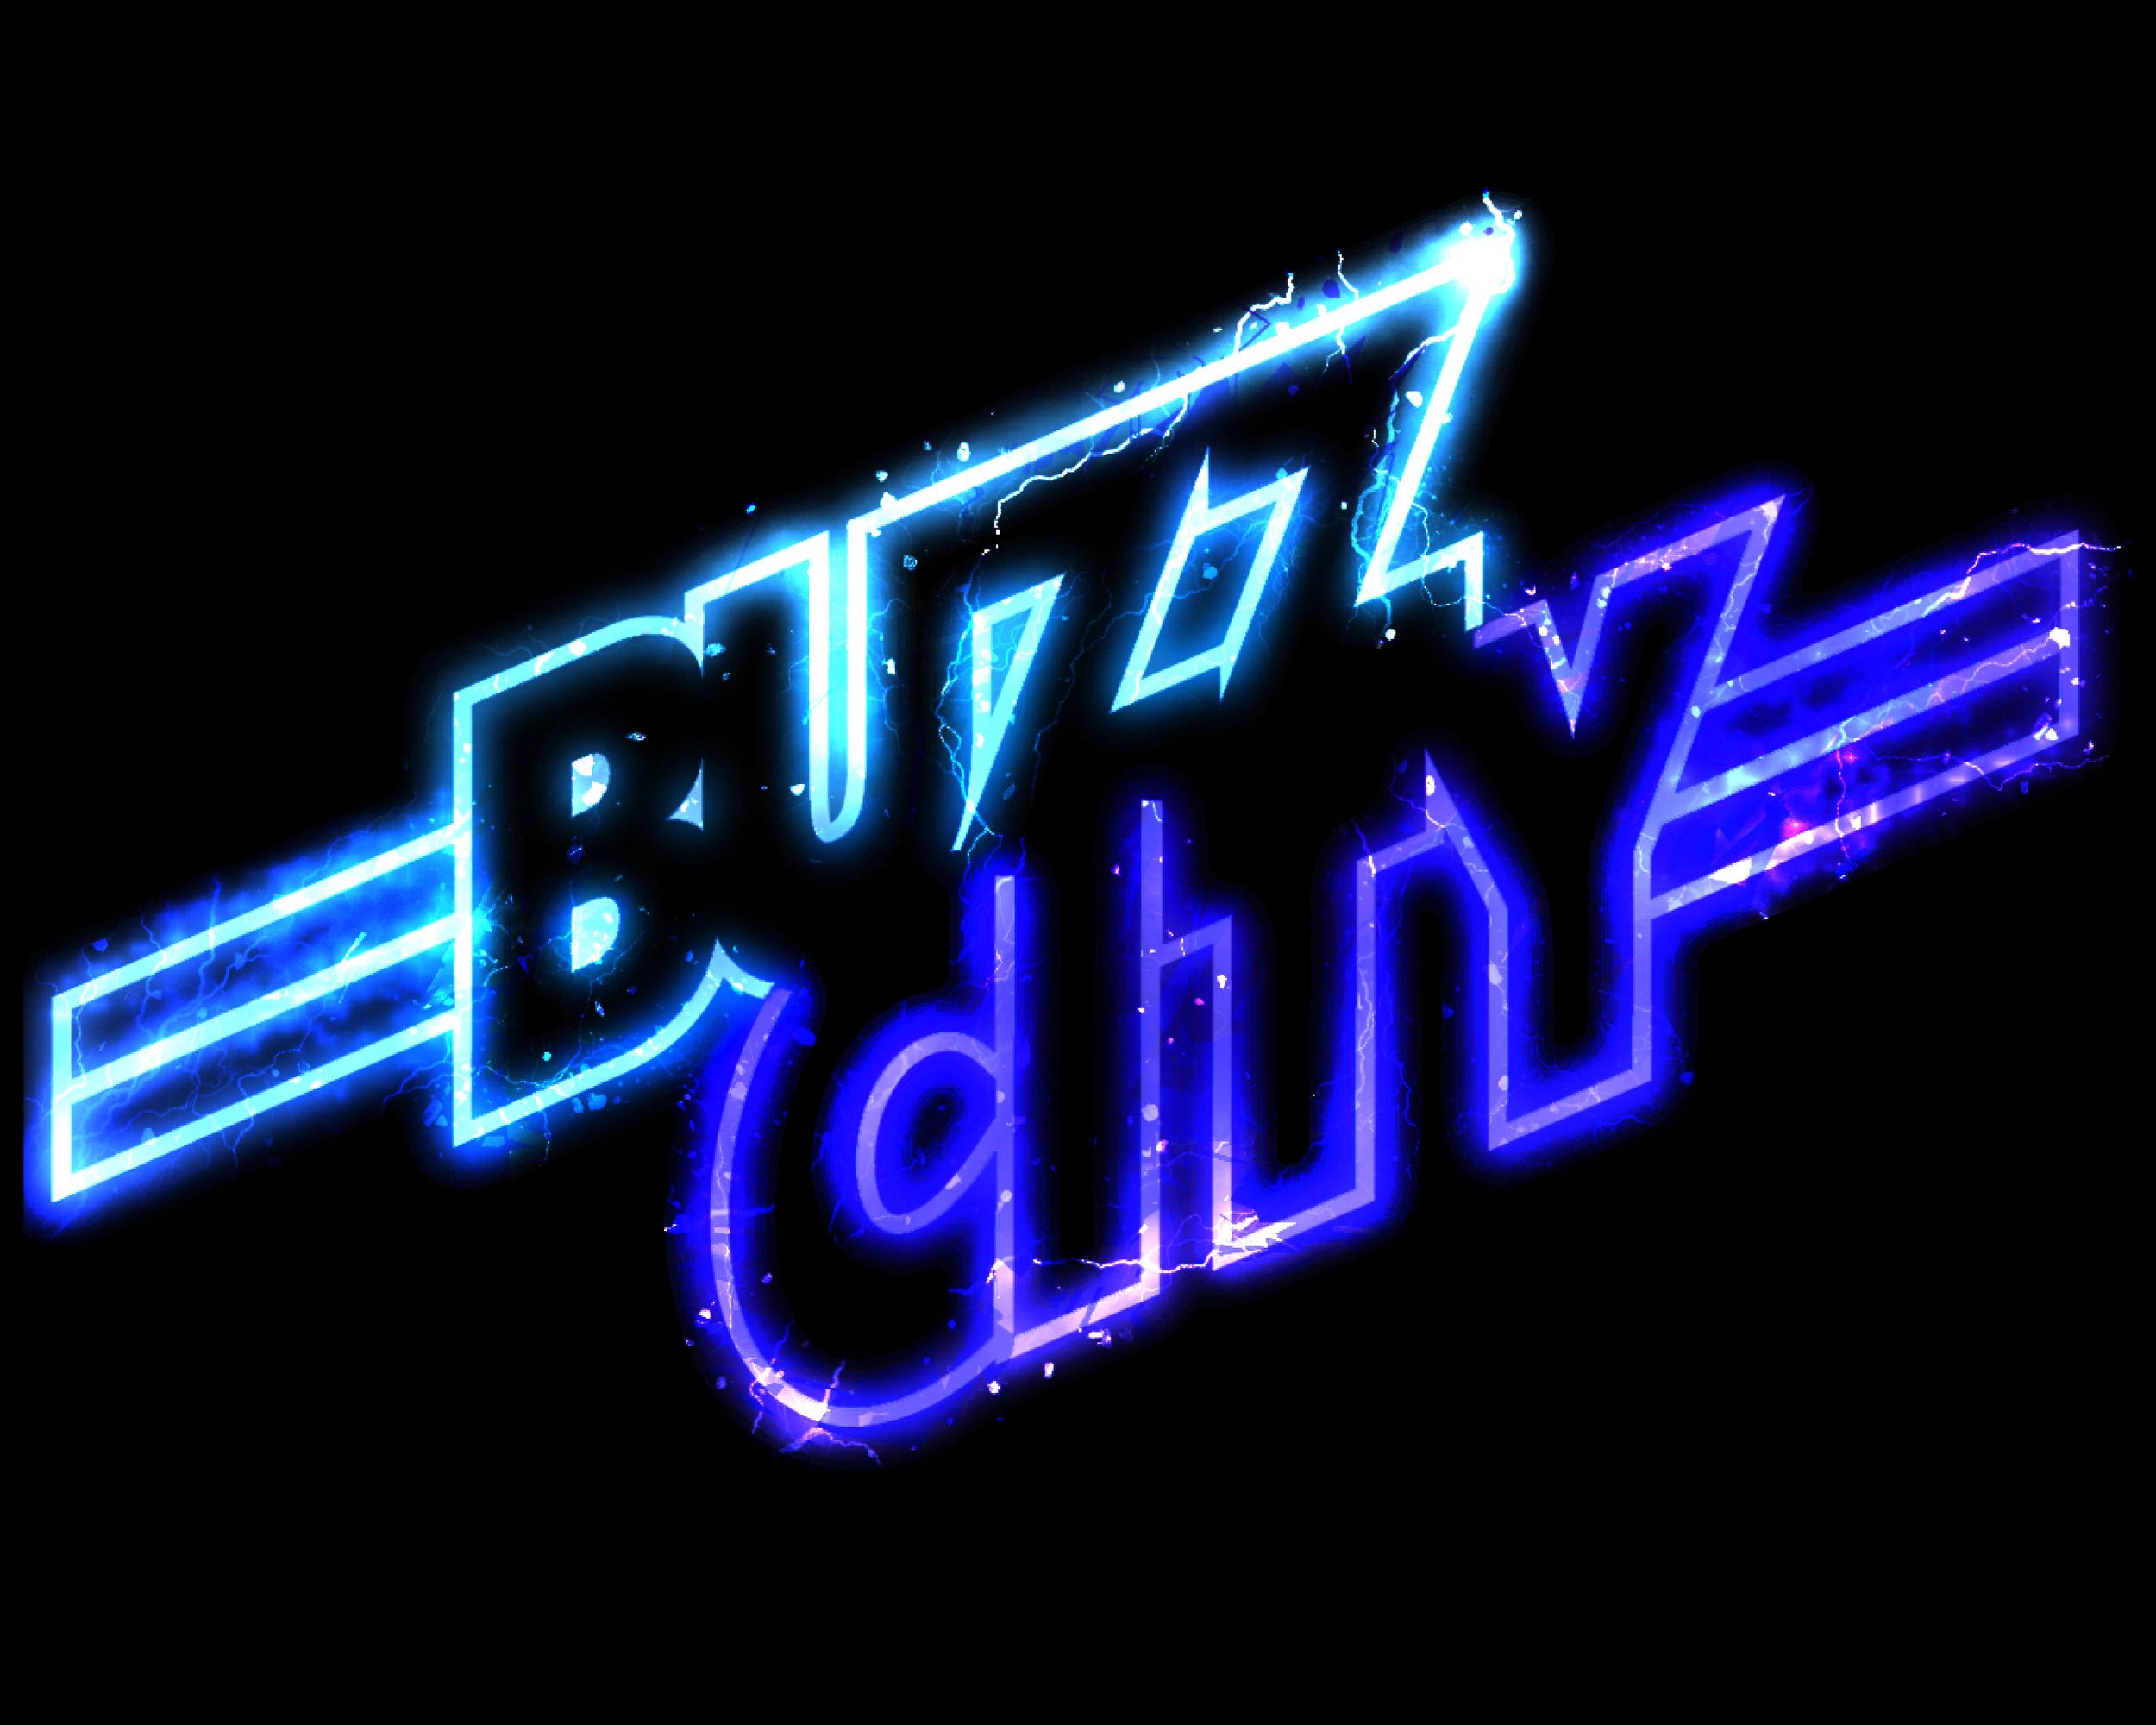 Buzz City Wallpaper